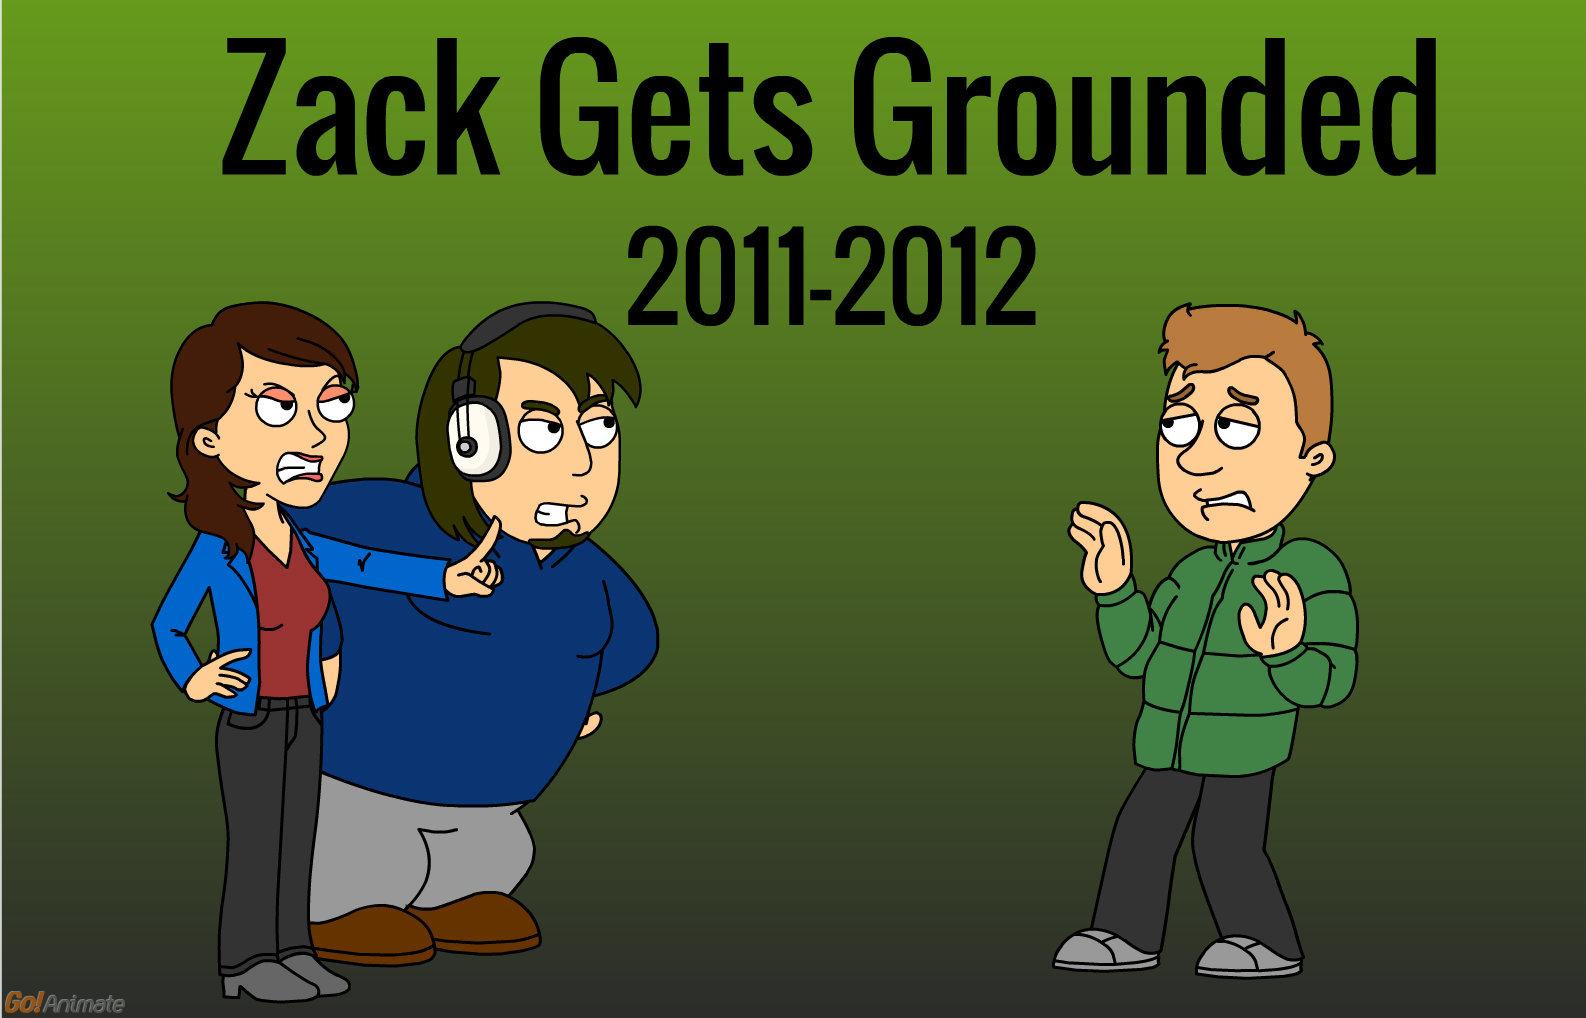 Zack Gets Grounded: The Original Series | GoAnipedia